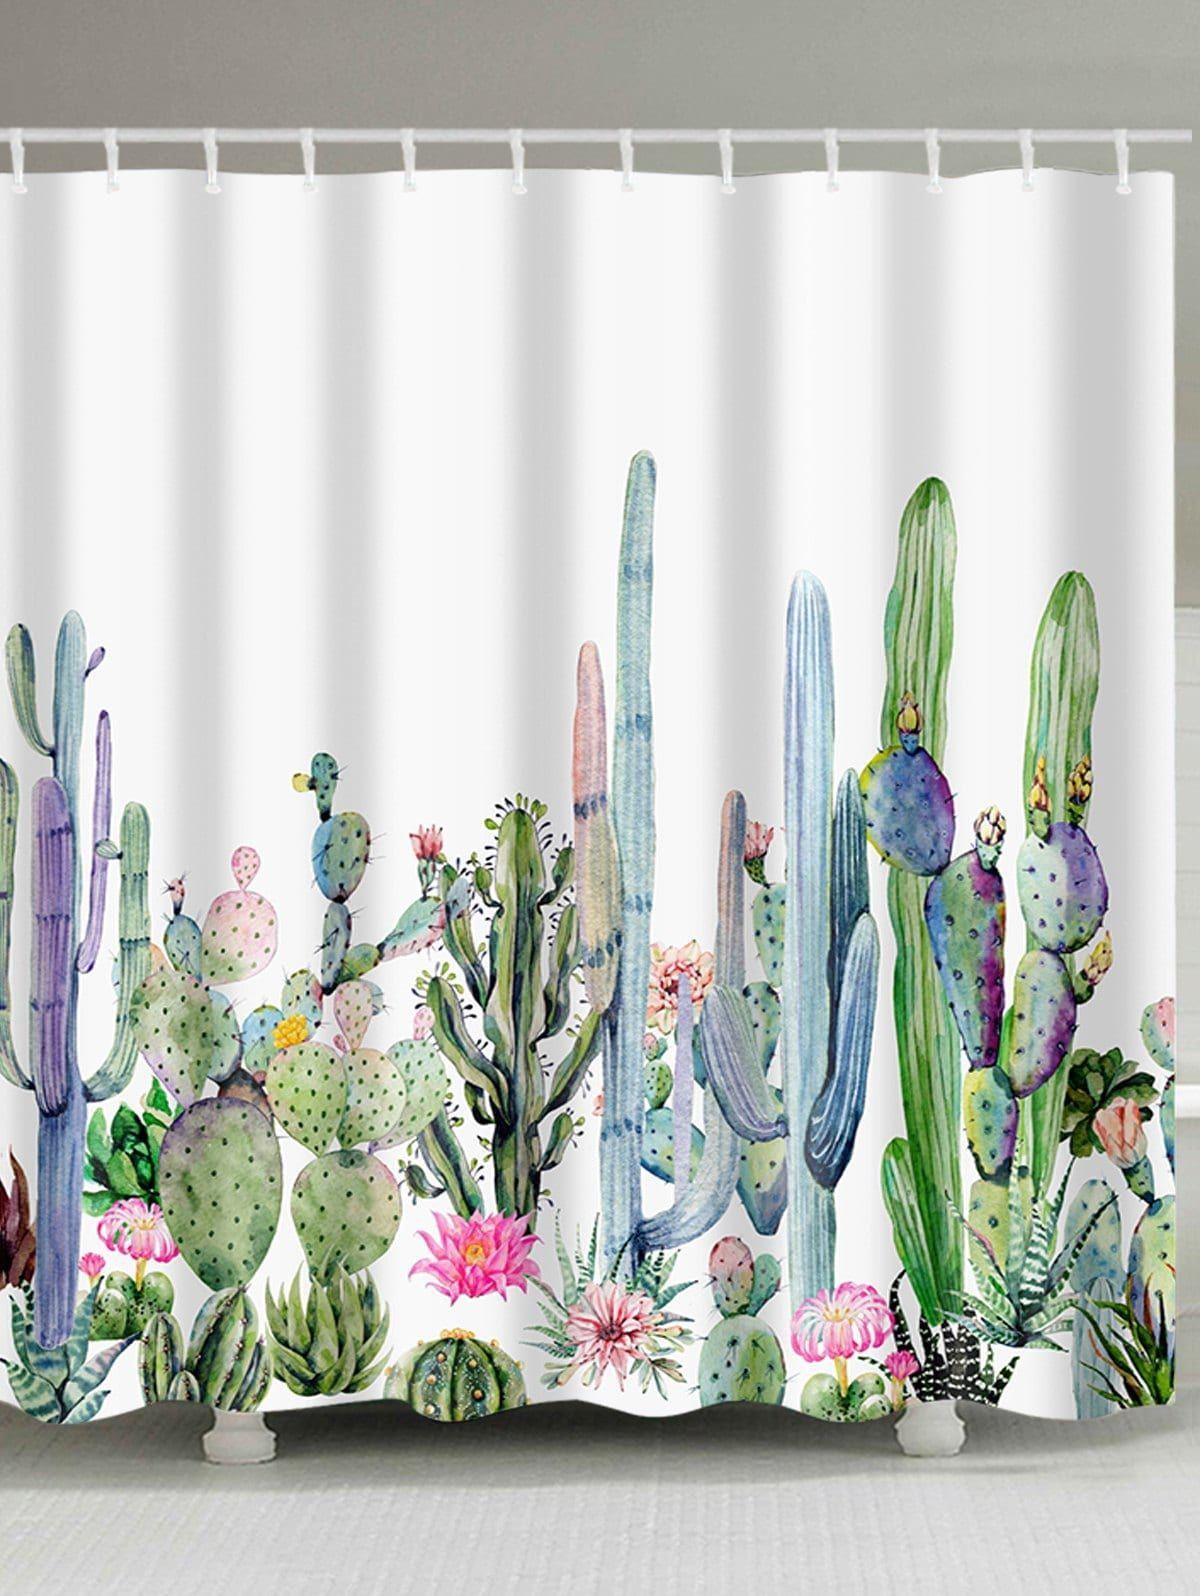 Green Plants Cactus Flowers Print Shower Curtain Cactus Shower